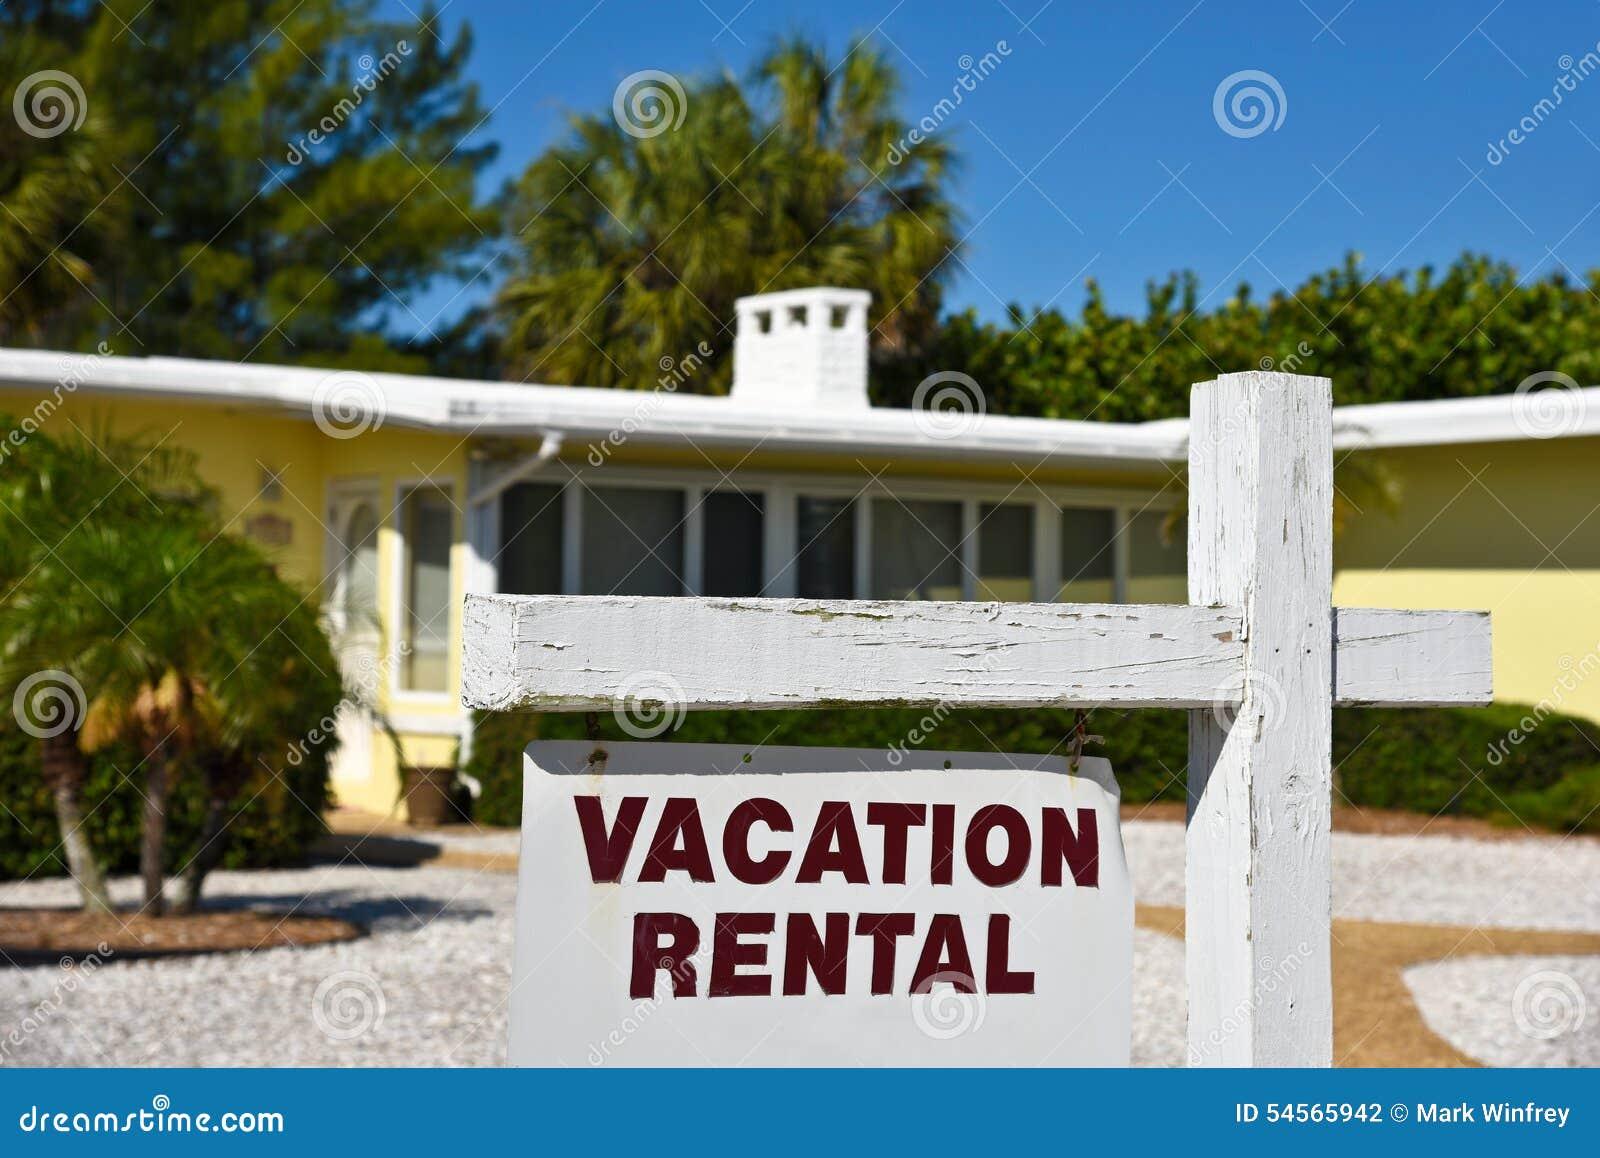 Vacation rentals business plan